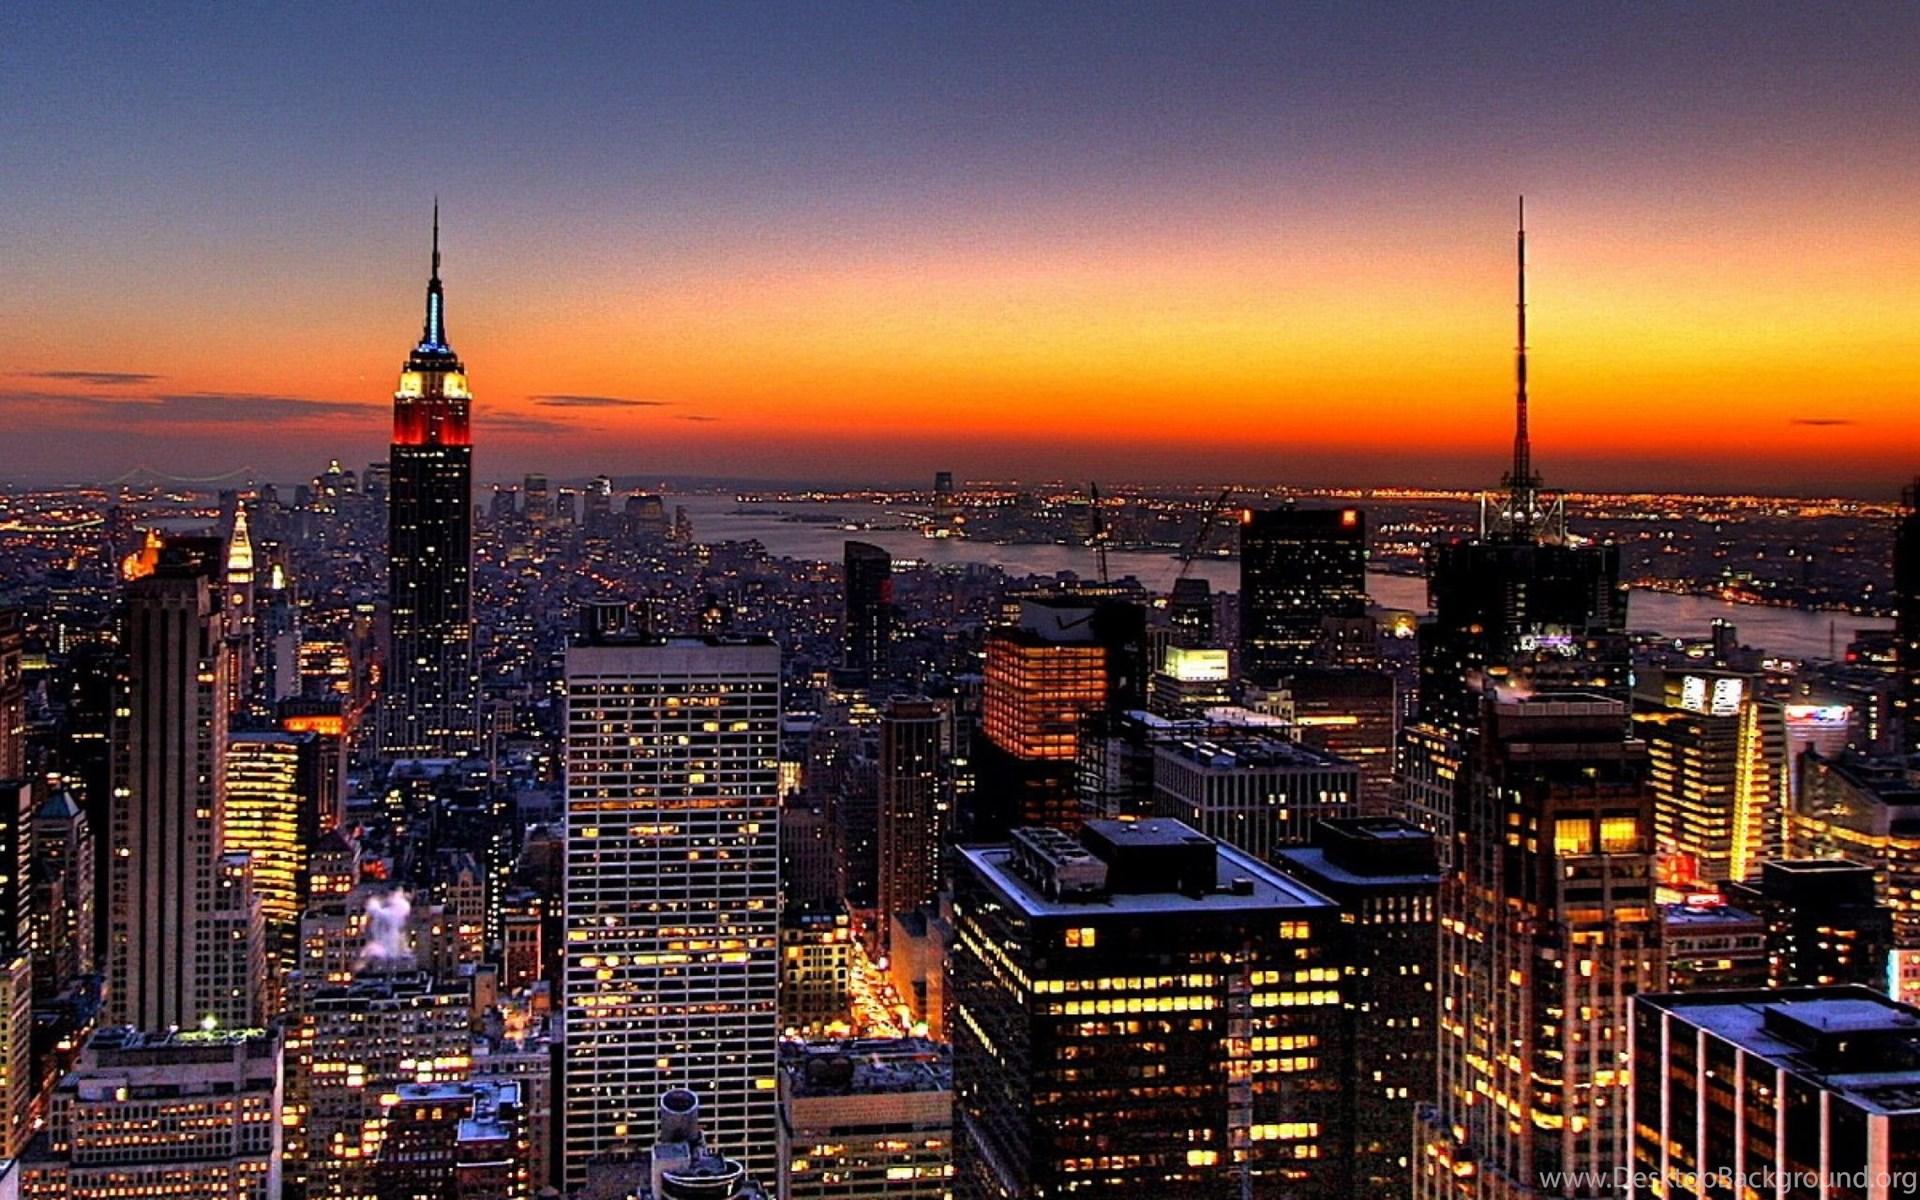 2048x2048 Serene Sunset Ipad Air Hd 4k Wallpapers Images: HD Wallpapers For IPad Beautiful City 2048x2048 Ipad 3